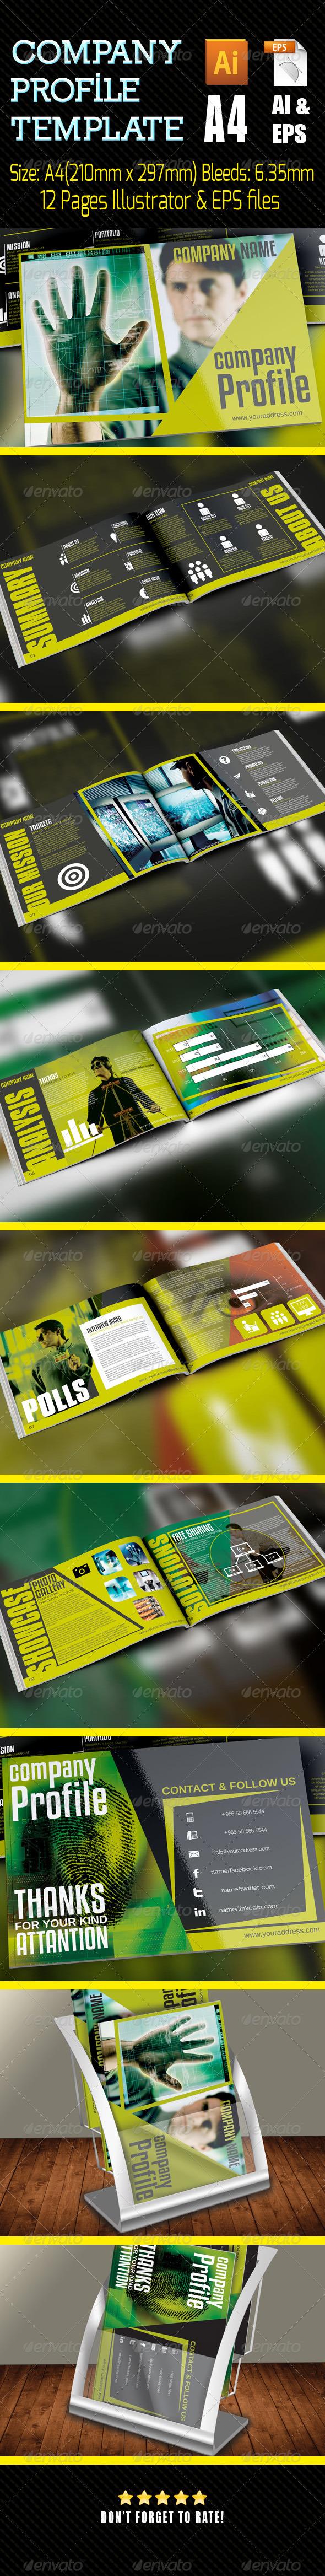 company-profile01